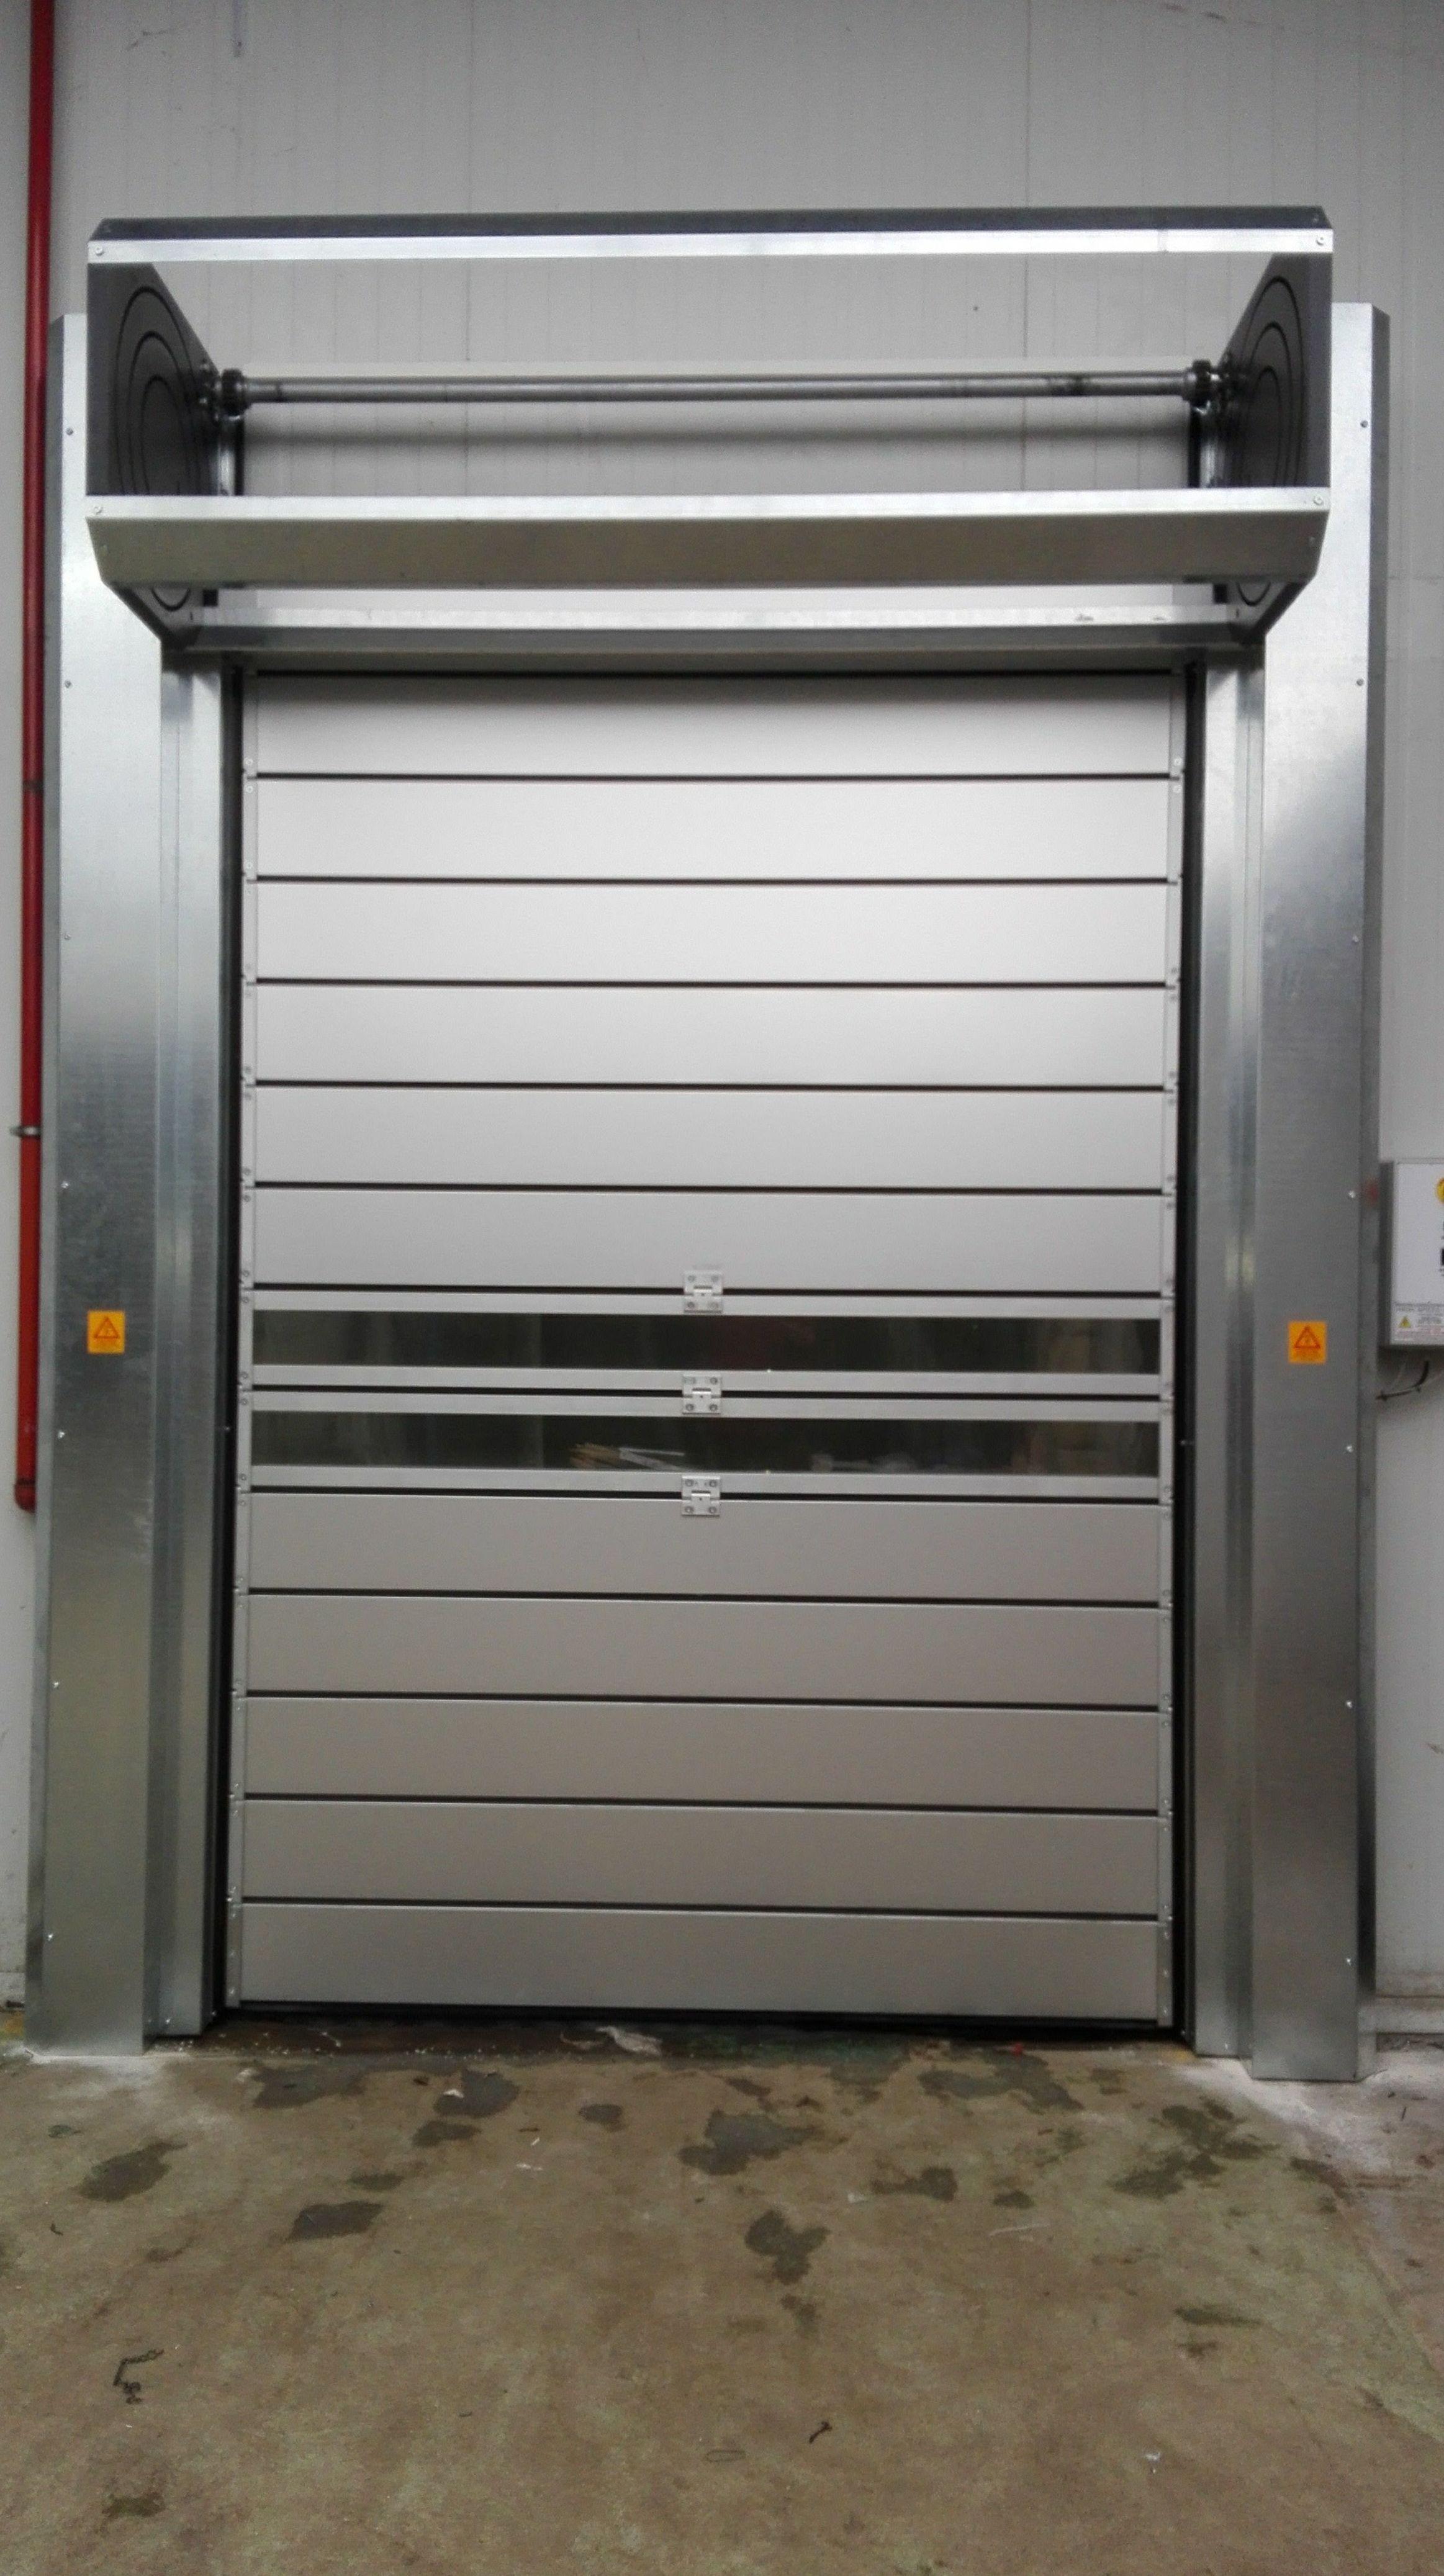 Puerta rápida 2 mts/sg  enrollable en espiral de paneles aislantes térmicos temperatura interior hasta -5ºC y +40ºC exterior